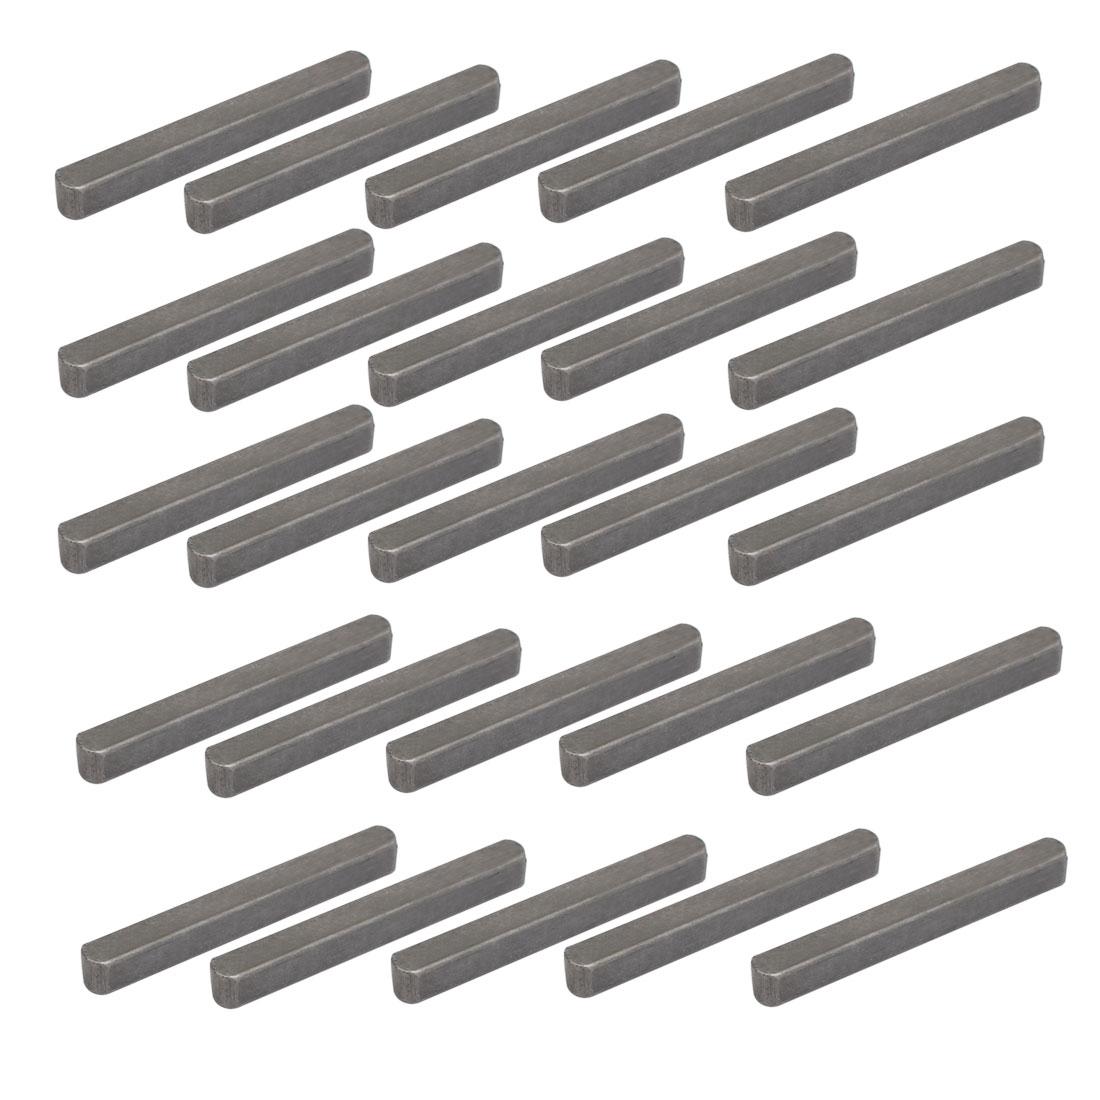 55mmx6mmx6mm Carbon Steel Key Stock To Lock Pulleys 25pcs